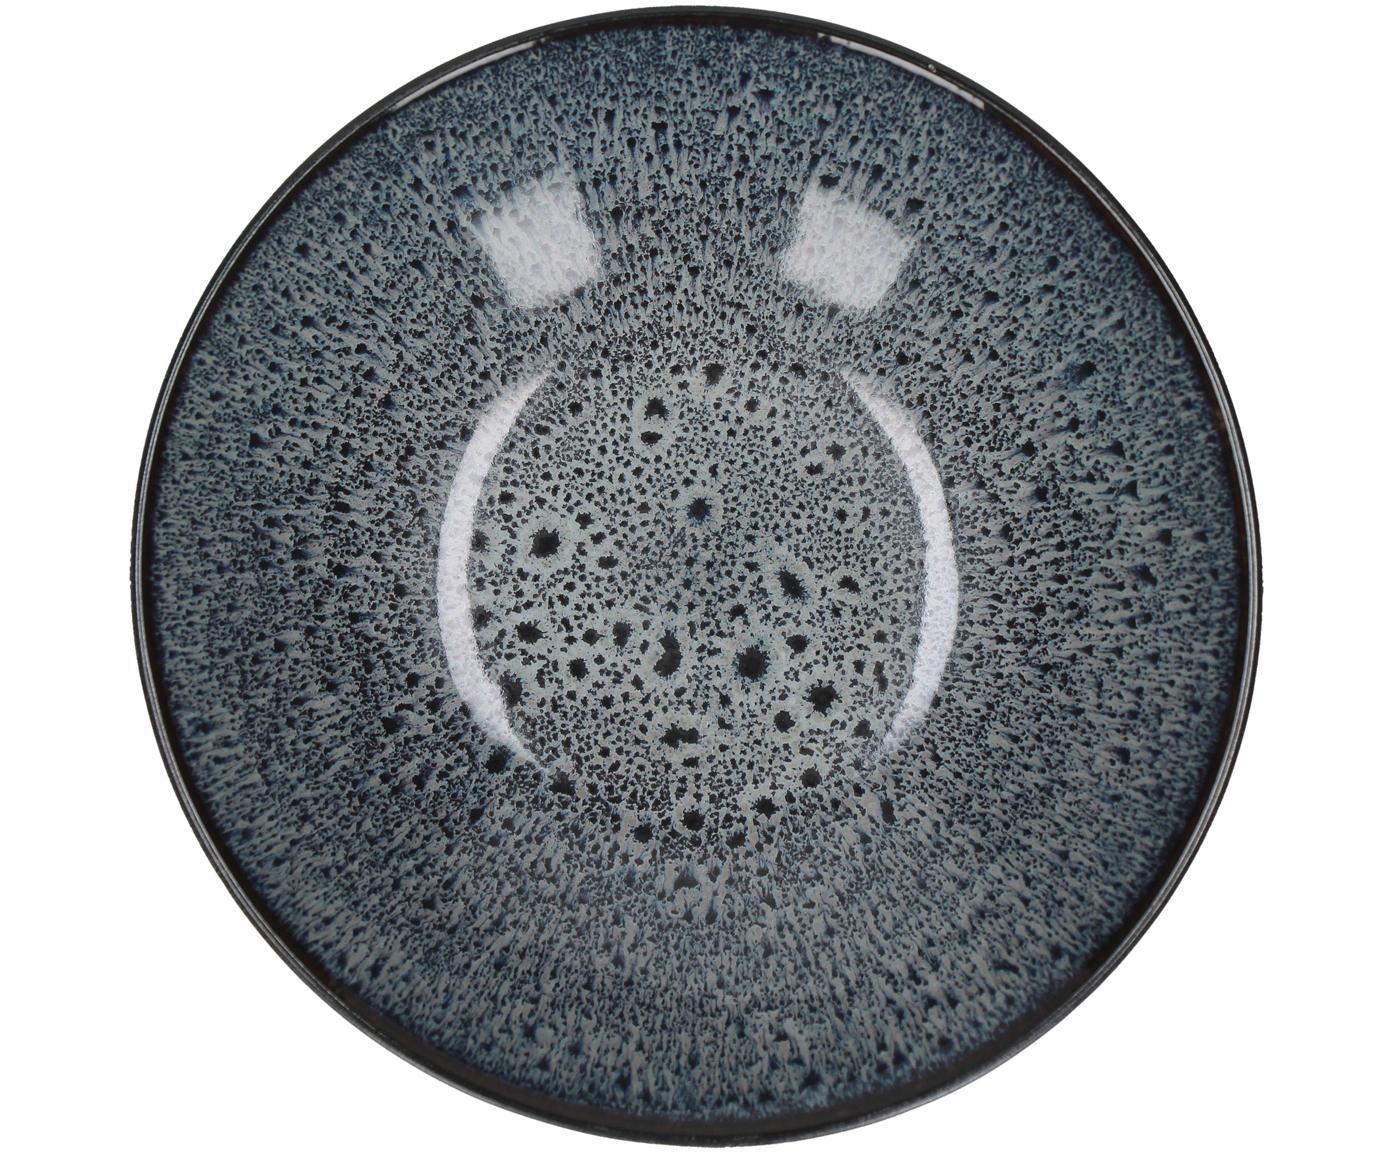 Soepborden Mirha. 4 stuks, Keramiek, Donkergrijs, Ø 18 cm